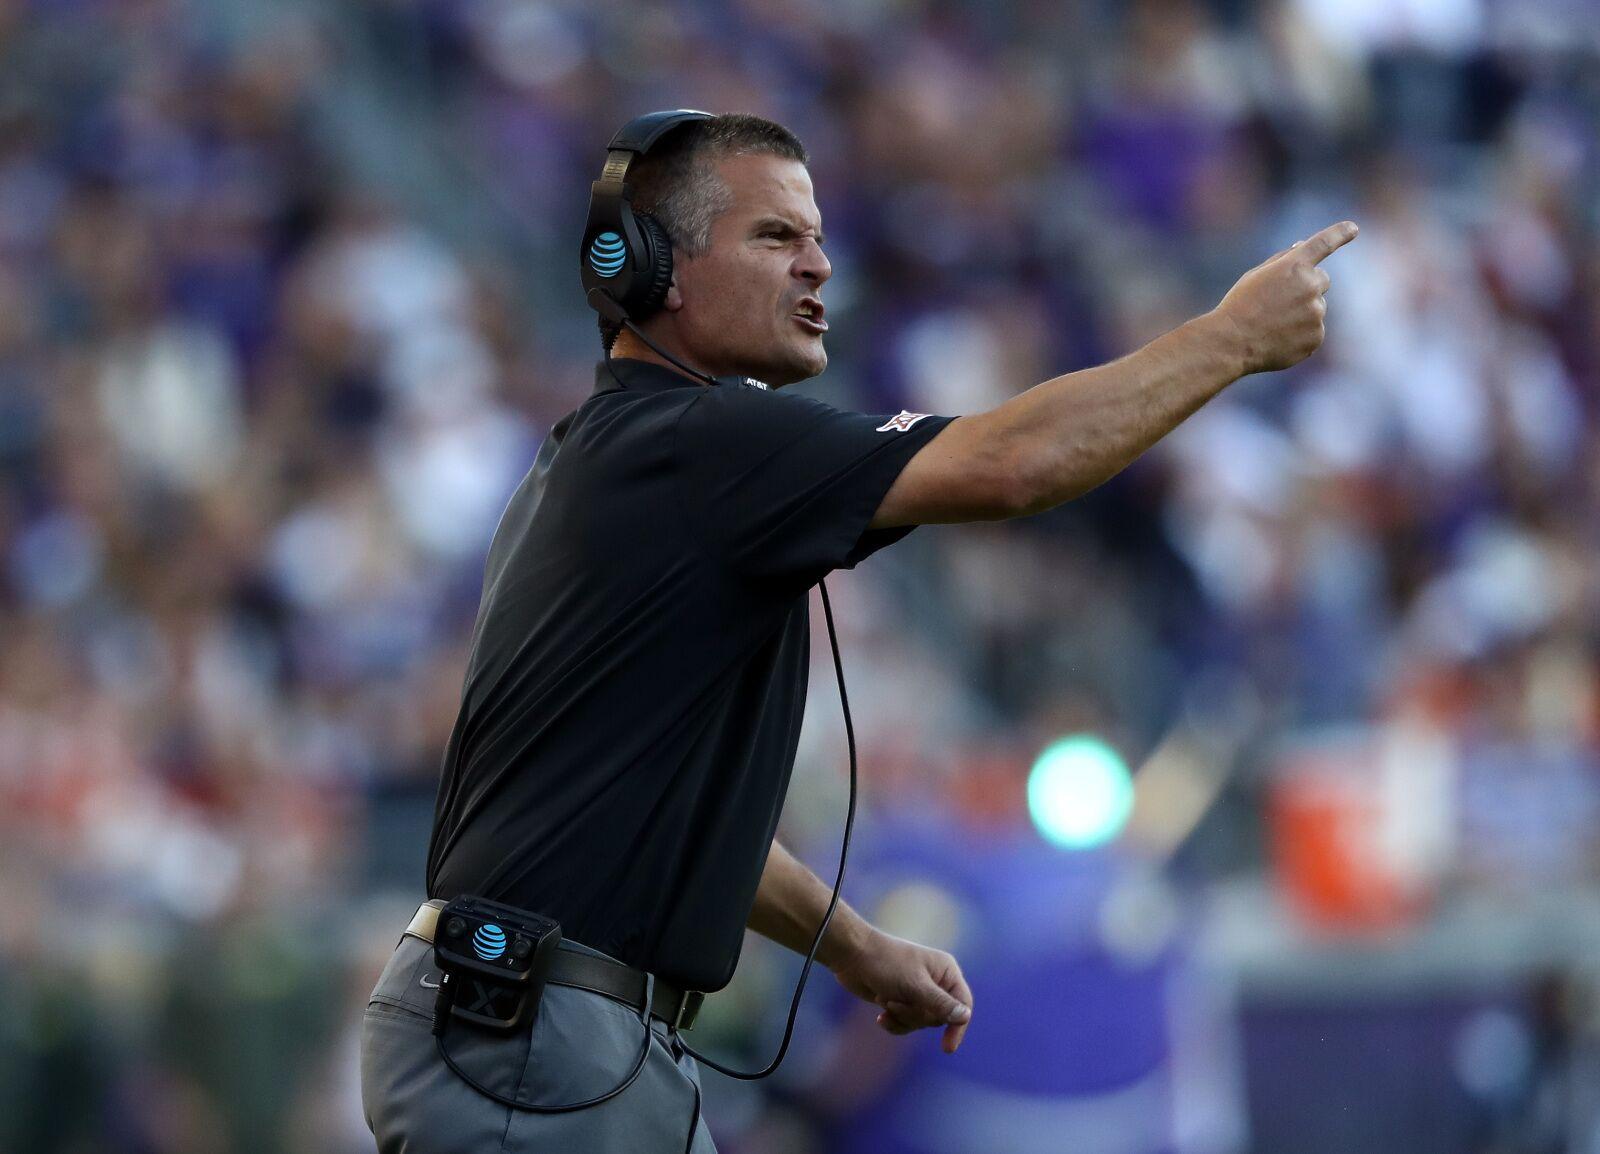 Texas Football: Todd Orlando could join USC instead of Texas Tech